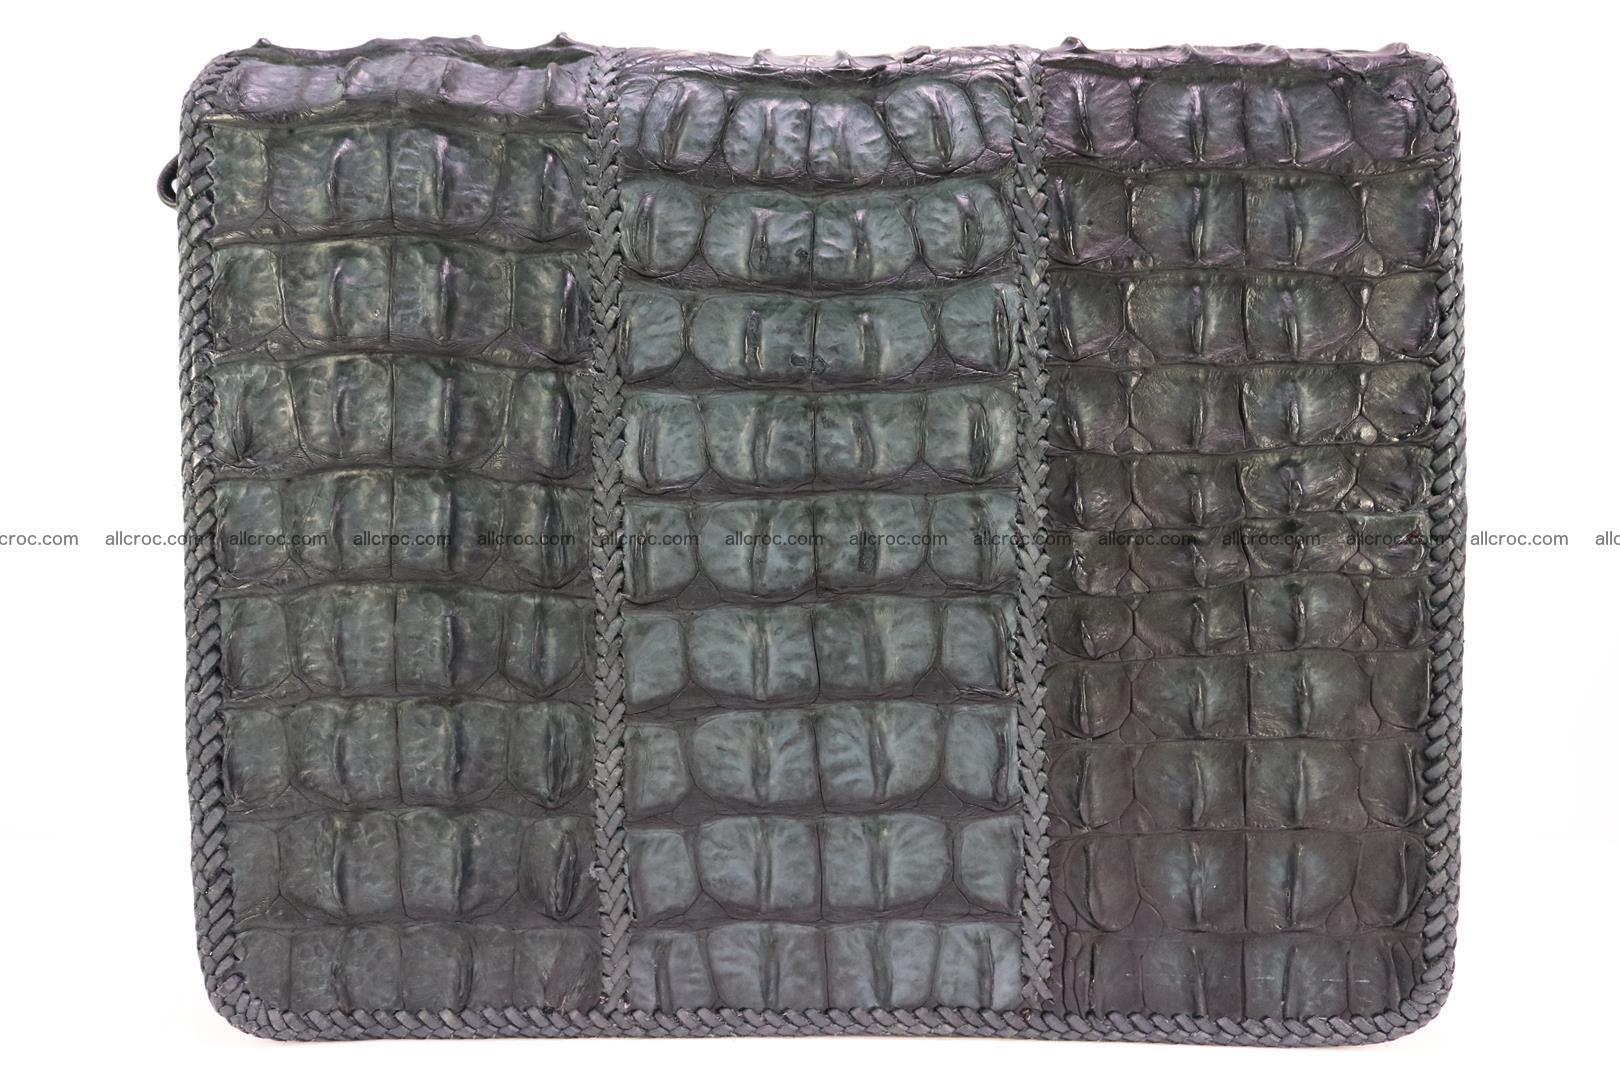 Crocodile skin shoulder bag with braided edges 146 Foto 1